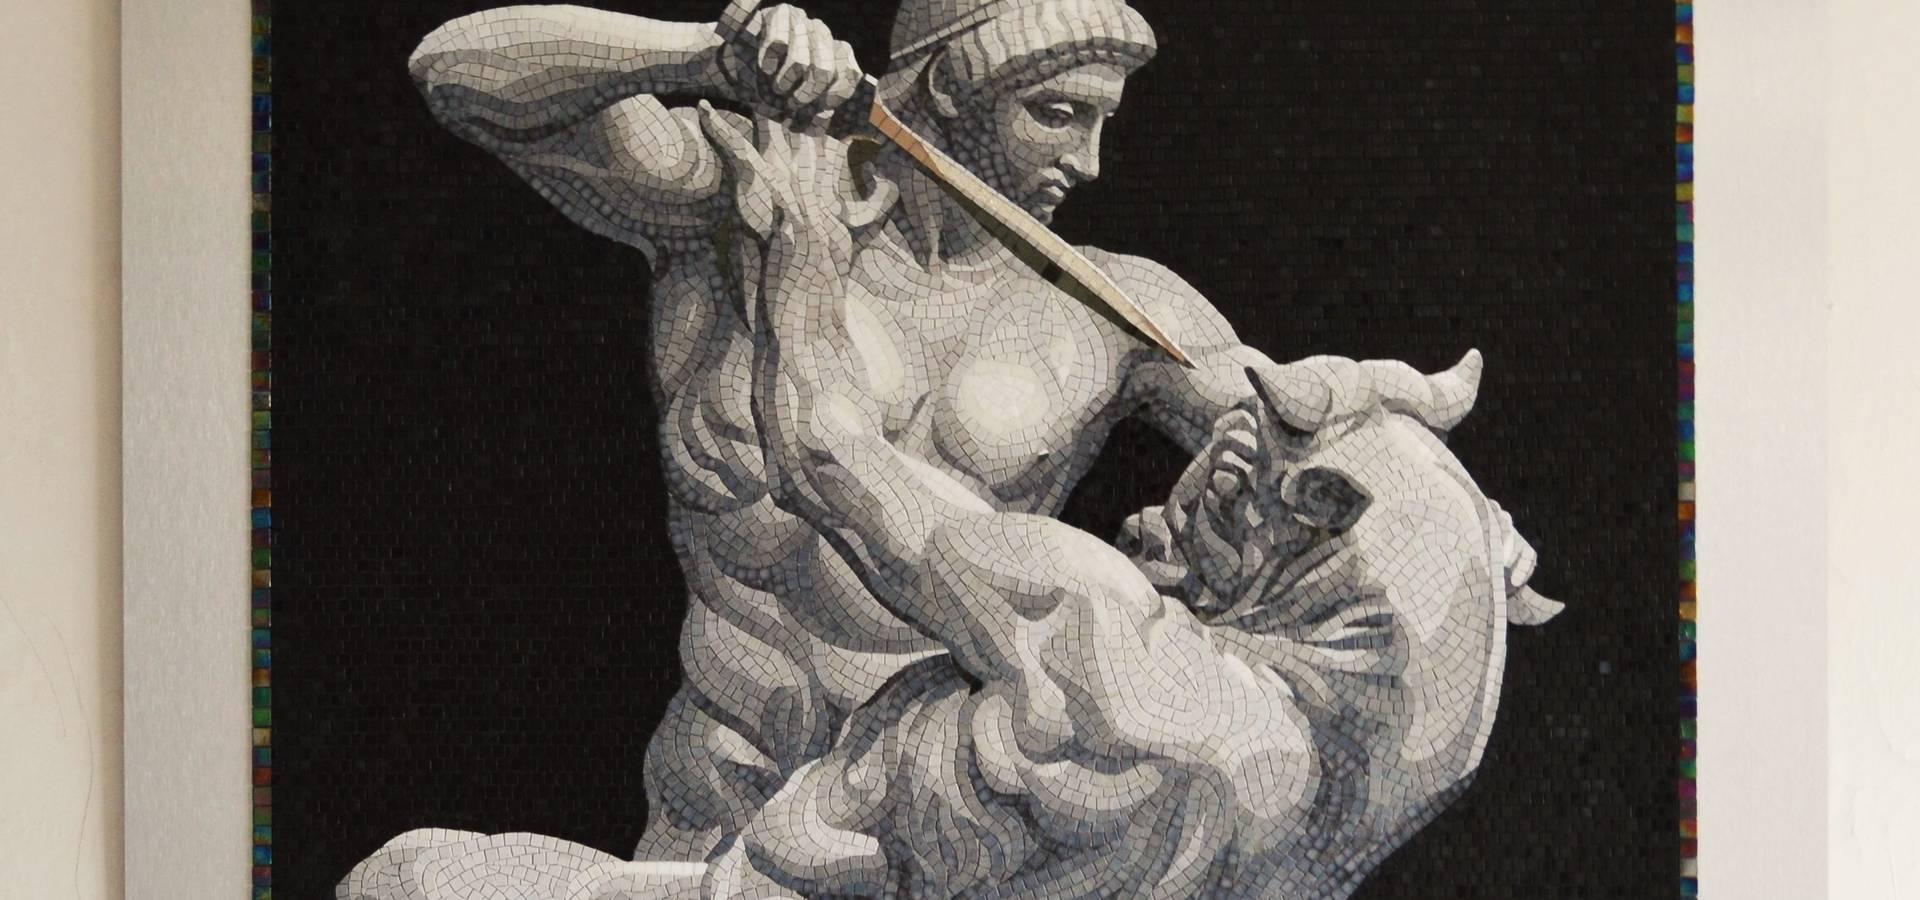 Mosaico Arte e Mestieri     —Pracownia mozaiki artystycznej